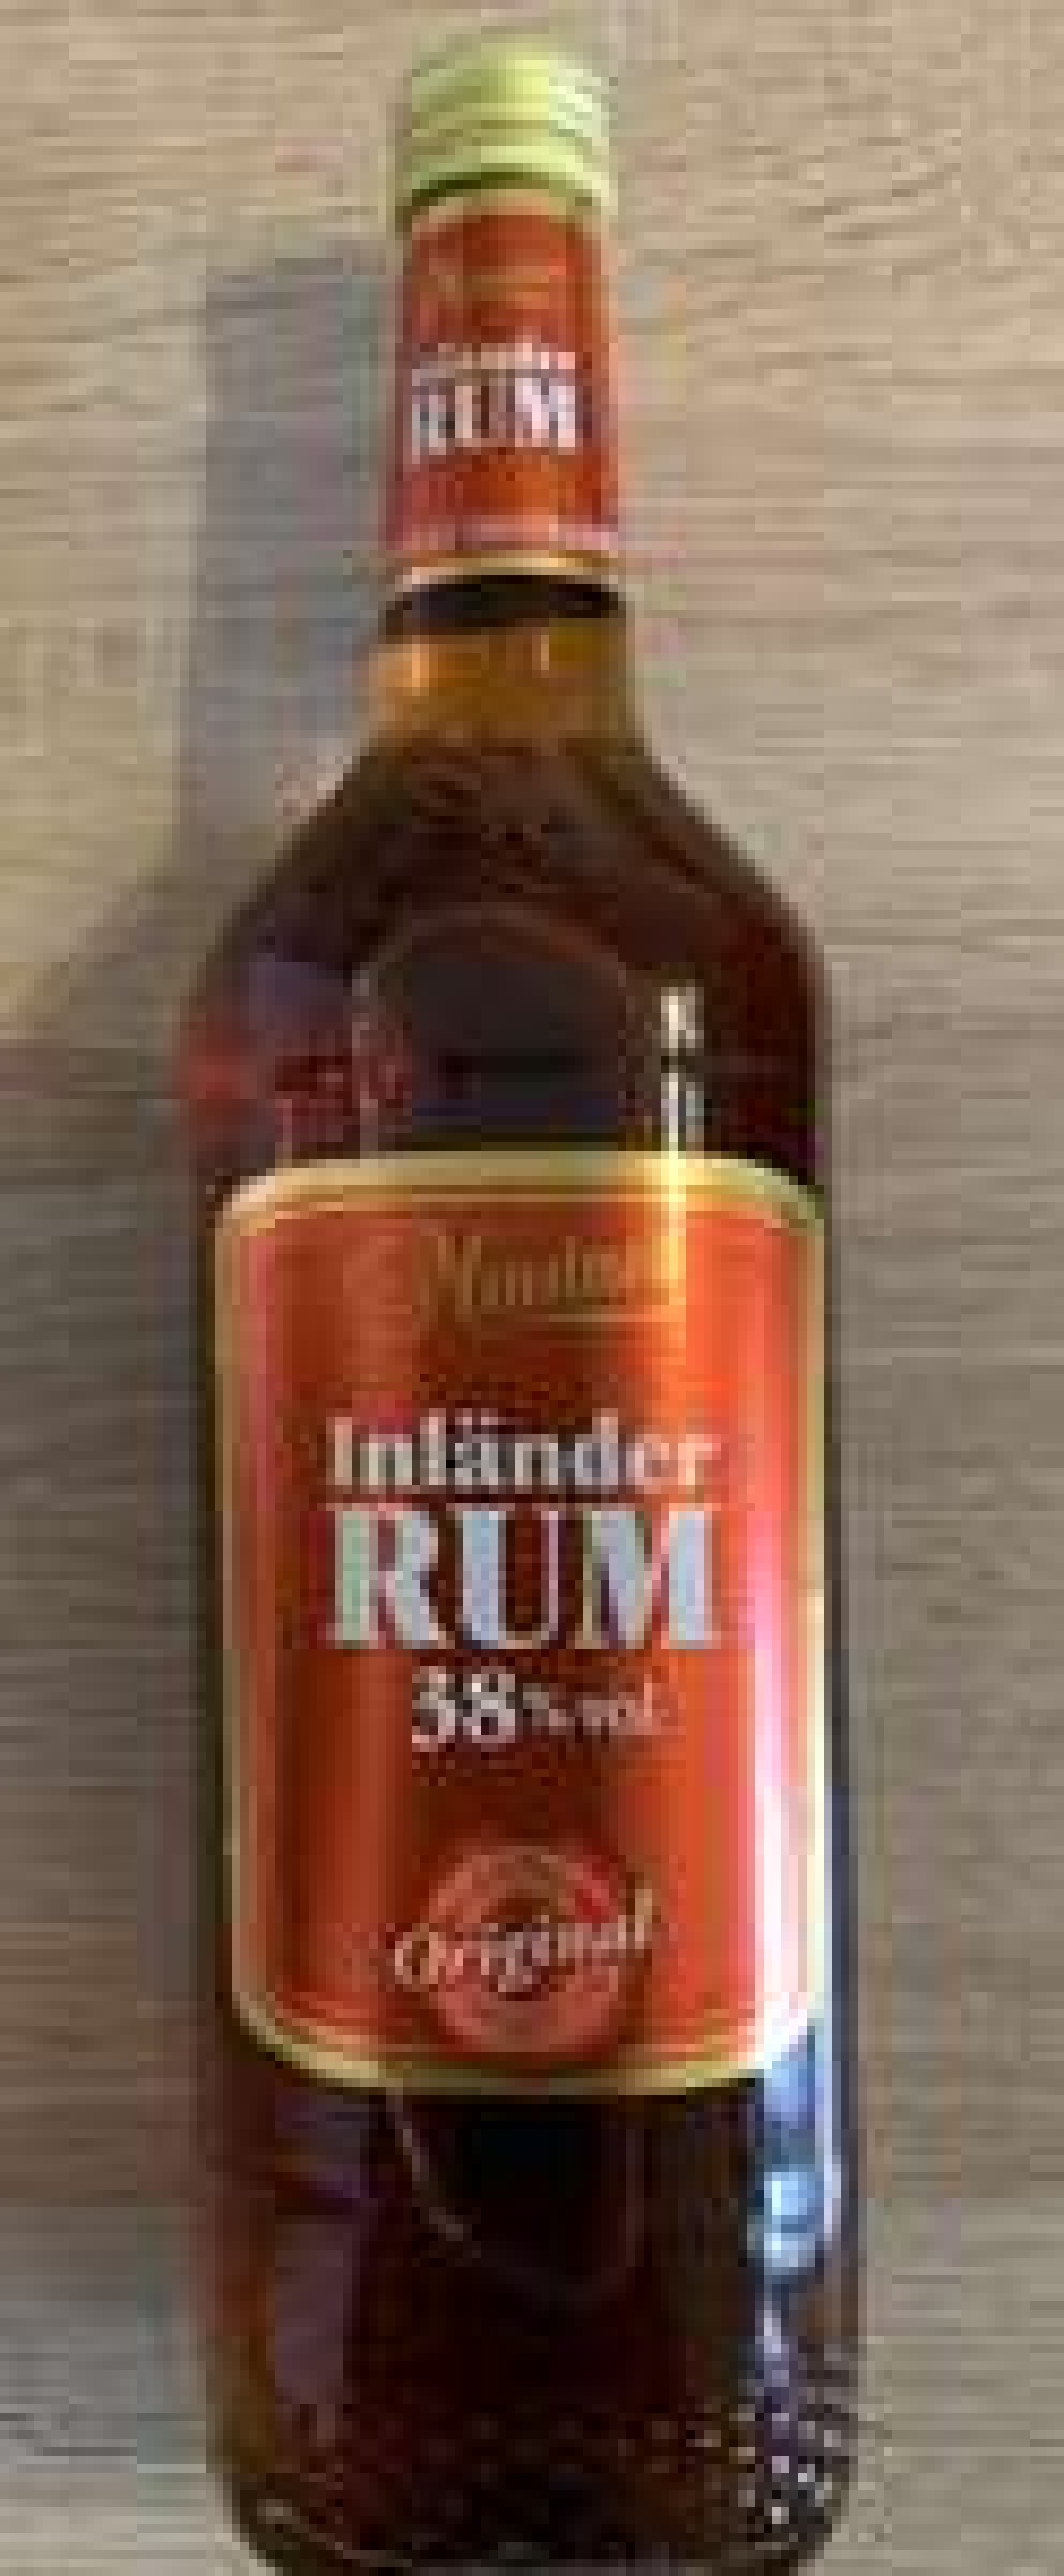 [Rabattkombi] Mautner Inländer Rum bei Eurospar